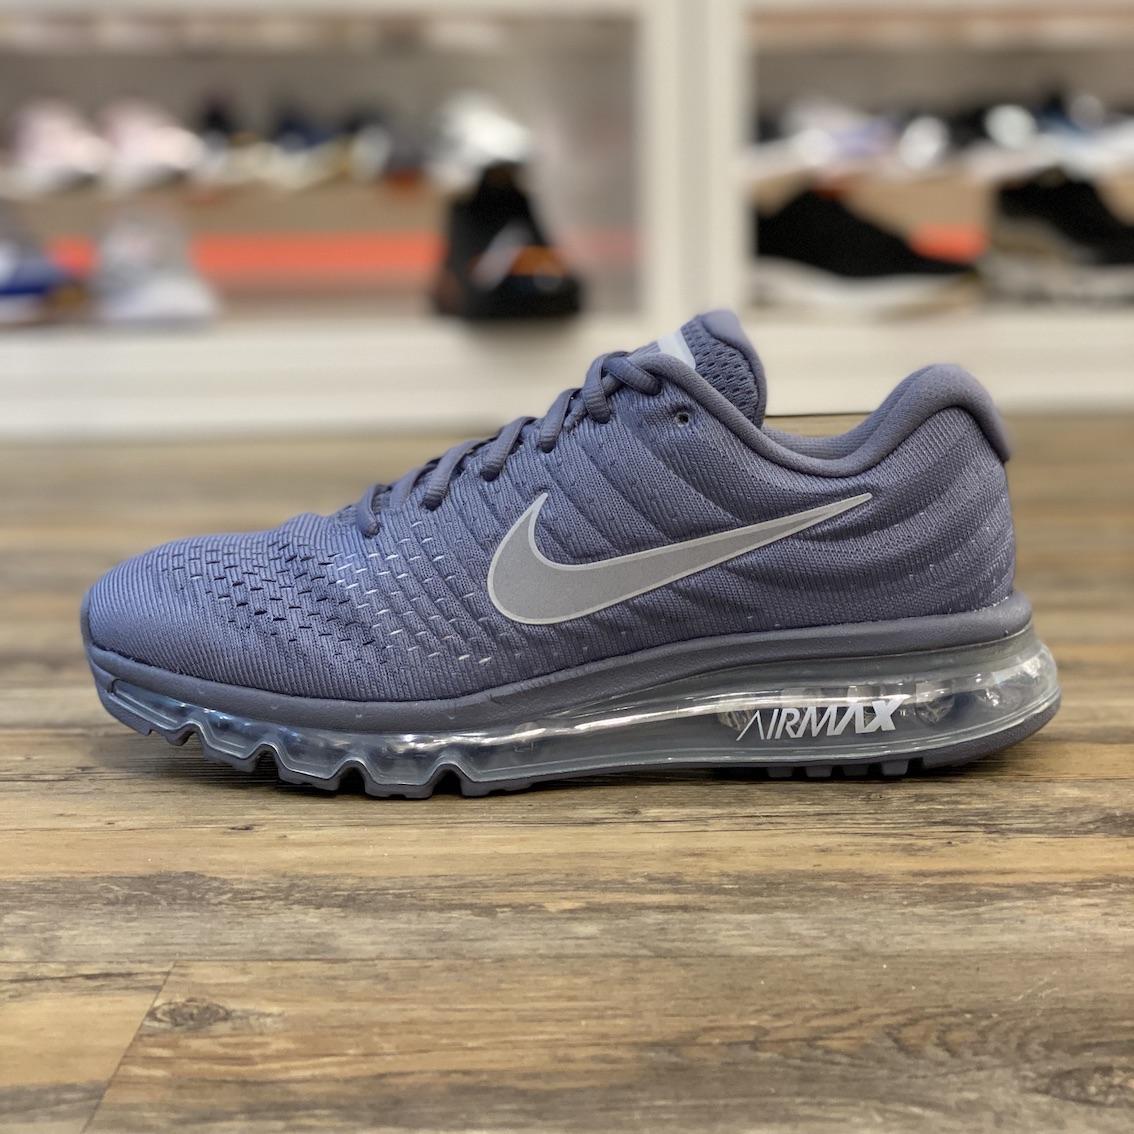 Details zu Nike Air Max 2017 SE Gr.42 Sneaker Schuhe blau AQ8628 001 Running Uni